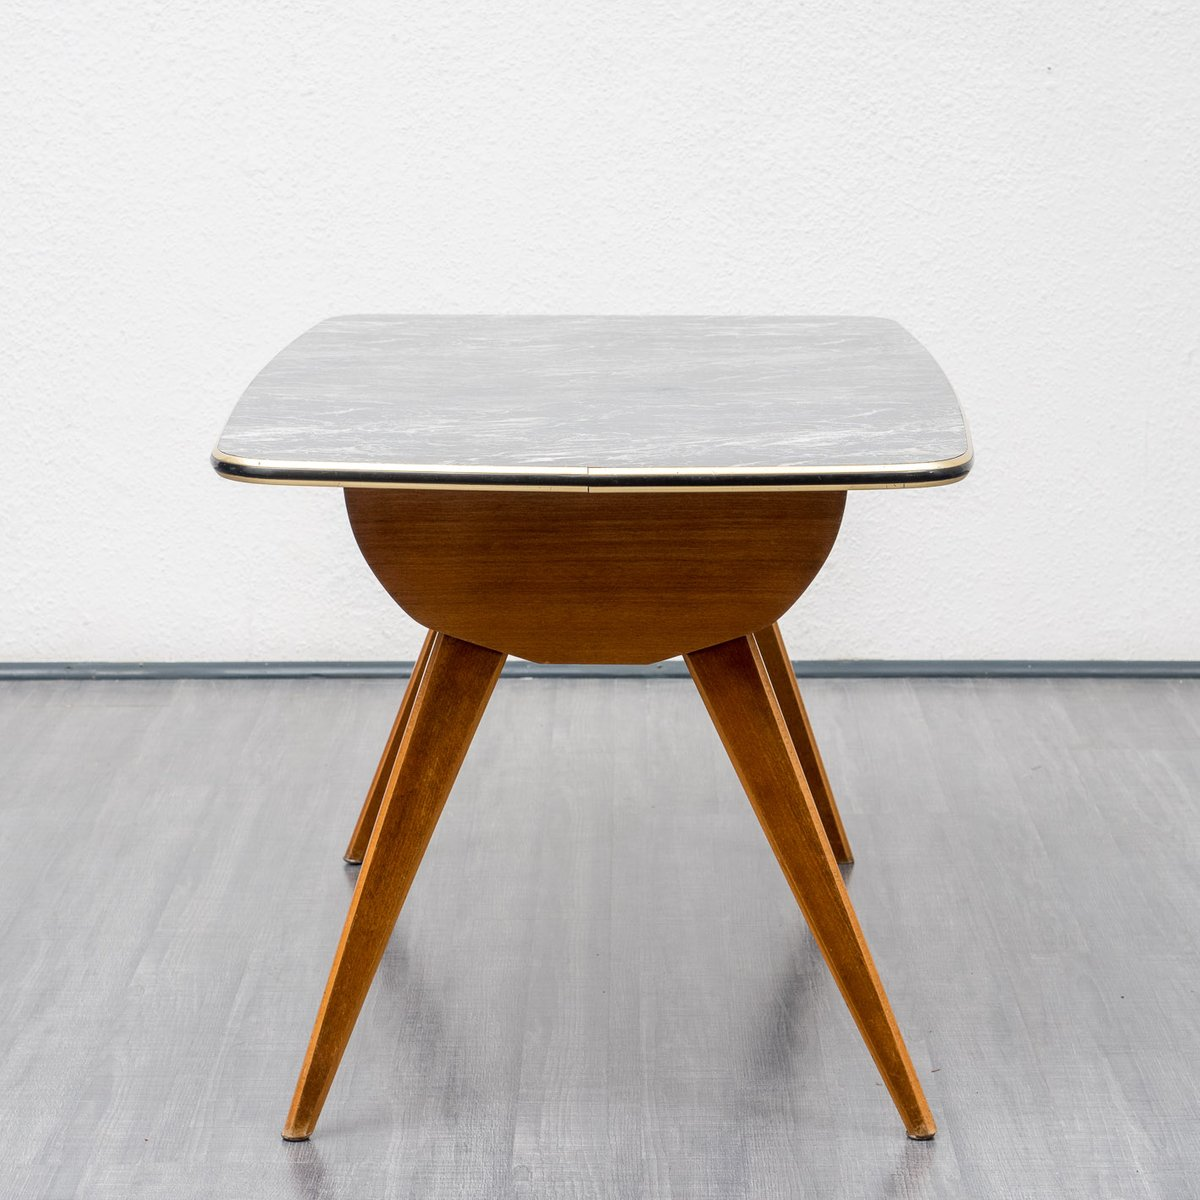 rare dining table attributed to ico parisi ariberto colombo